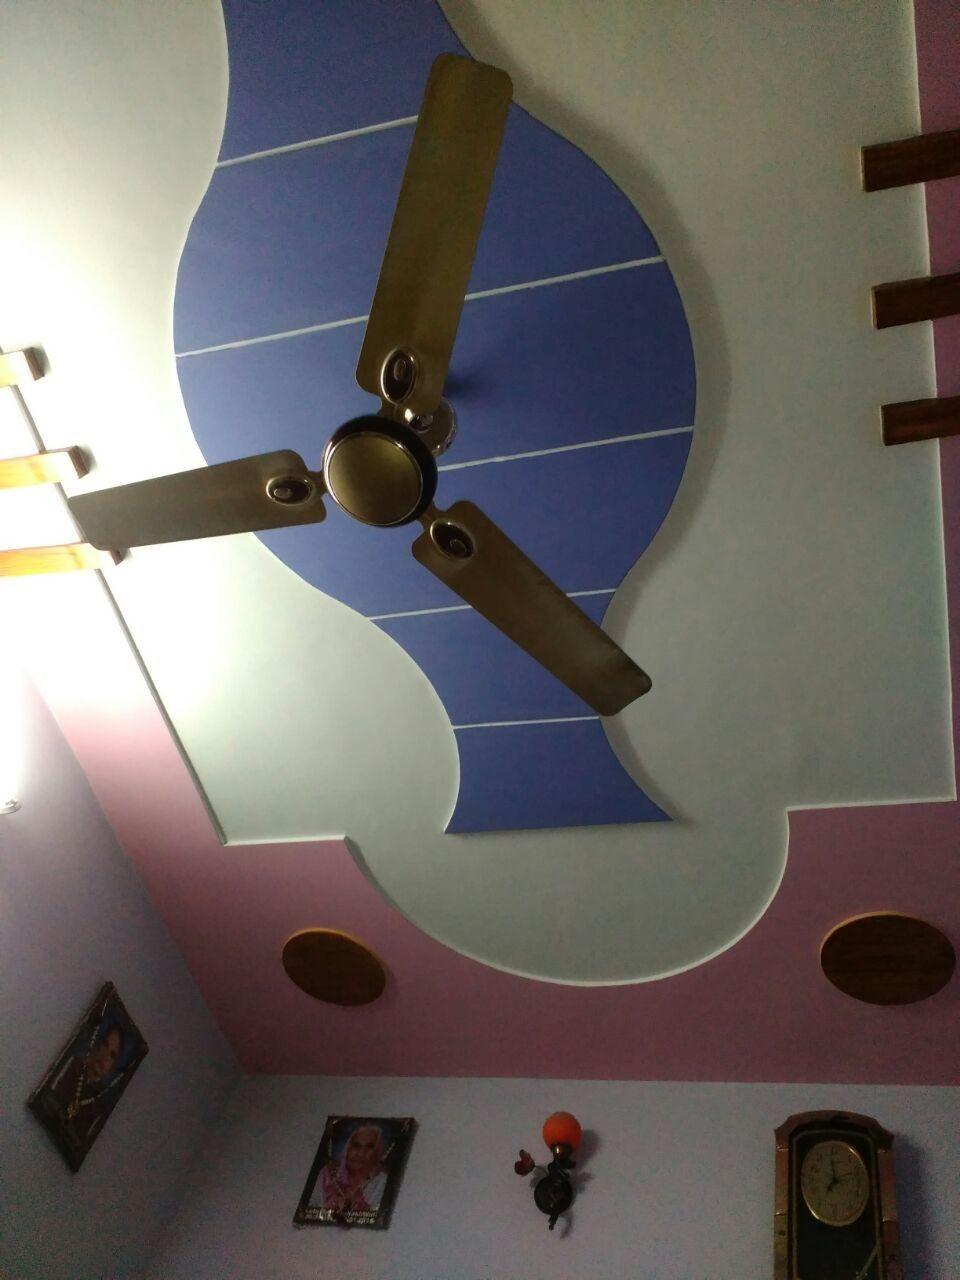 Pin By Pramod Kumar On Pop Design For Roof Plaster Ceiling Design Pop False Ceiling Design Pop Ceiling Design